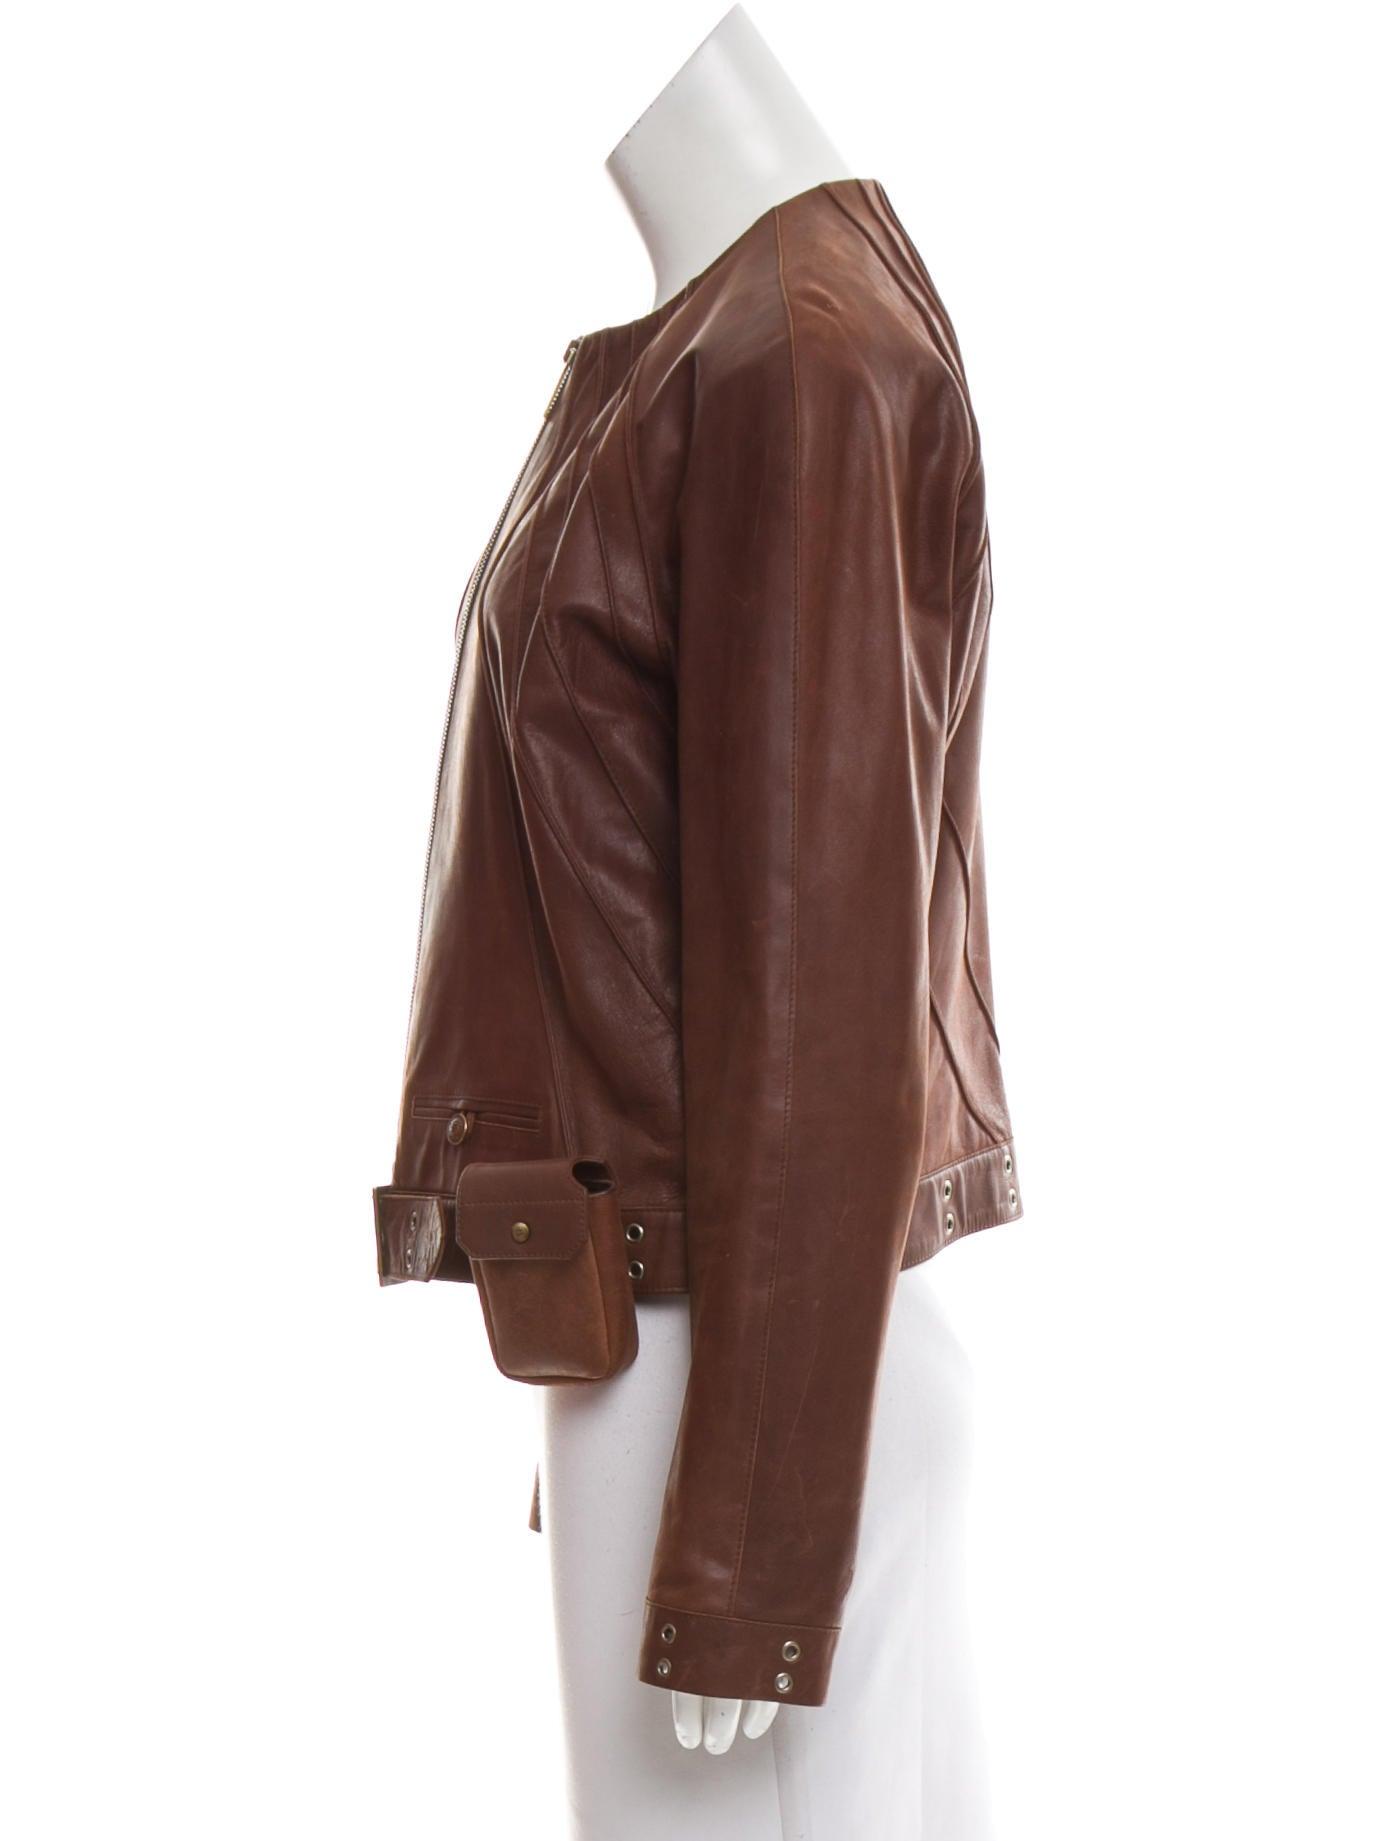 Christian Dior Leather Grommet Jacket